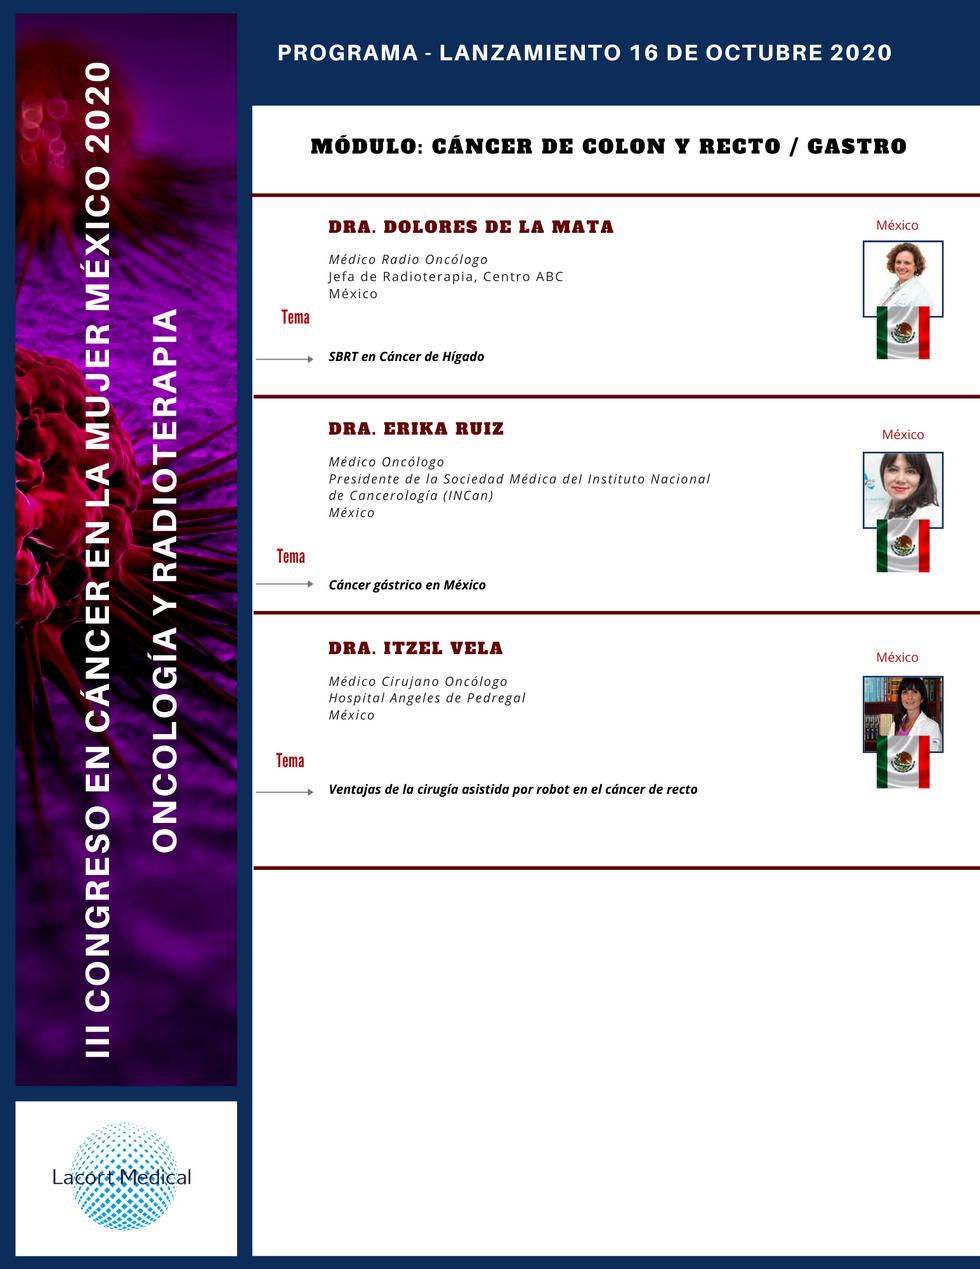 Mexico agenda pag 3.png